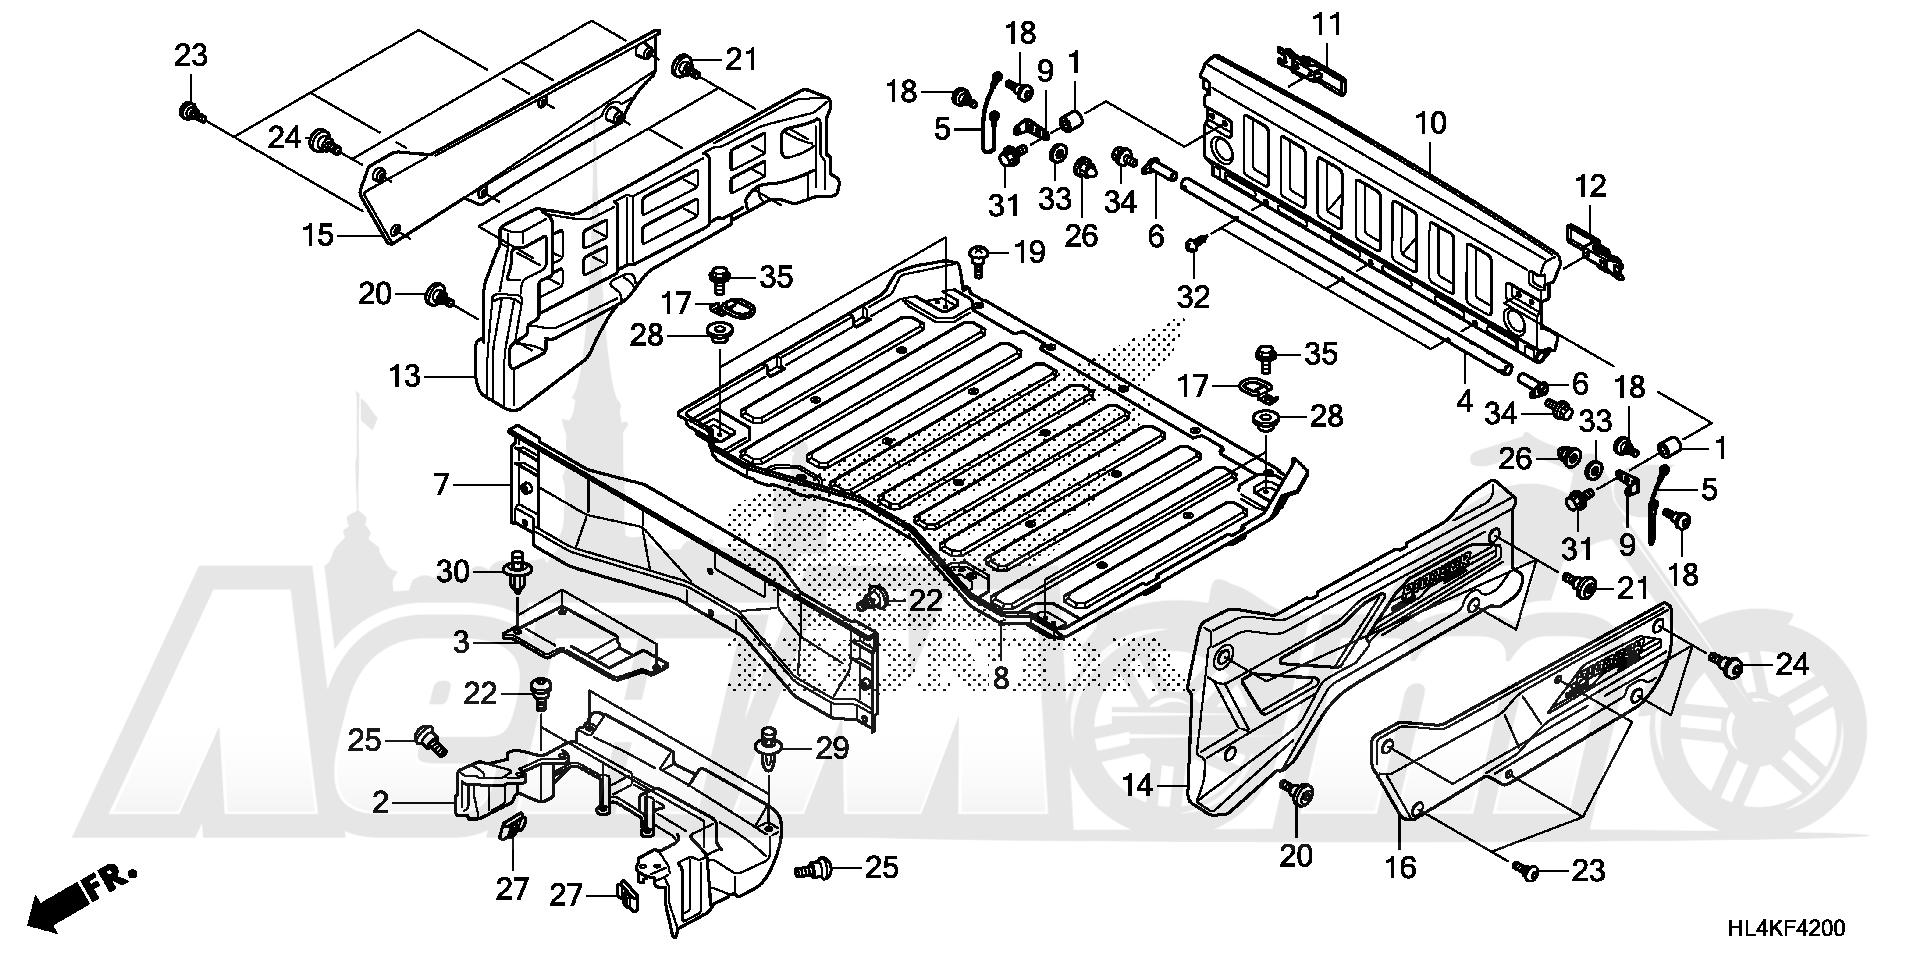 Запчасти для Квадроцикла Honda 2019 SXS1000M5L Раздел: BED PLATE AND REAR GATE (1) | BED пластина и зад GATE (1)